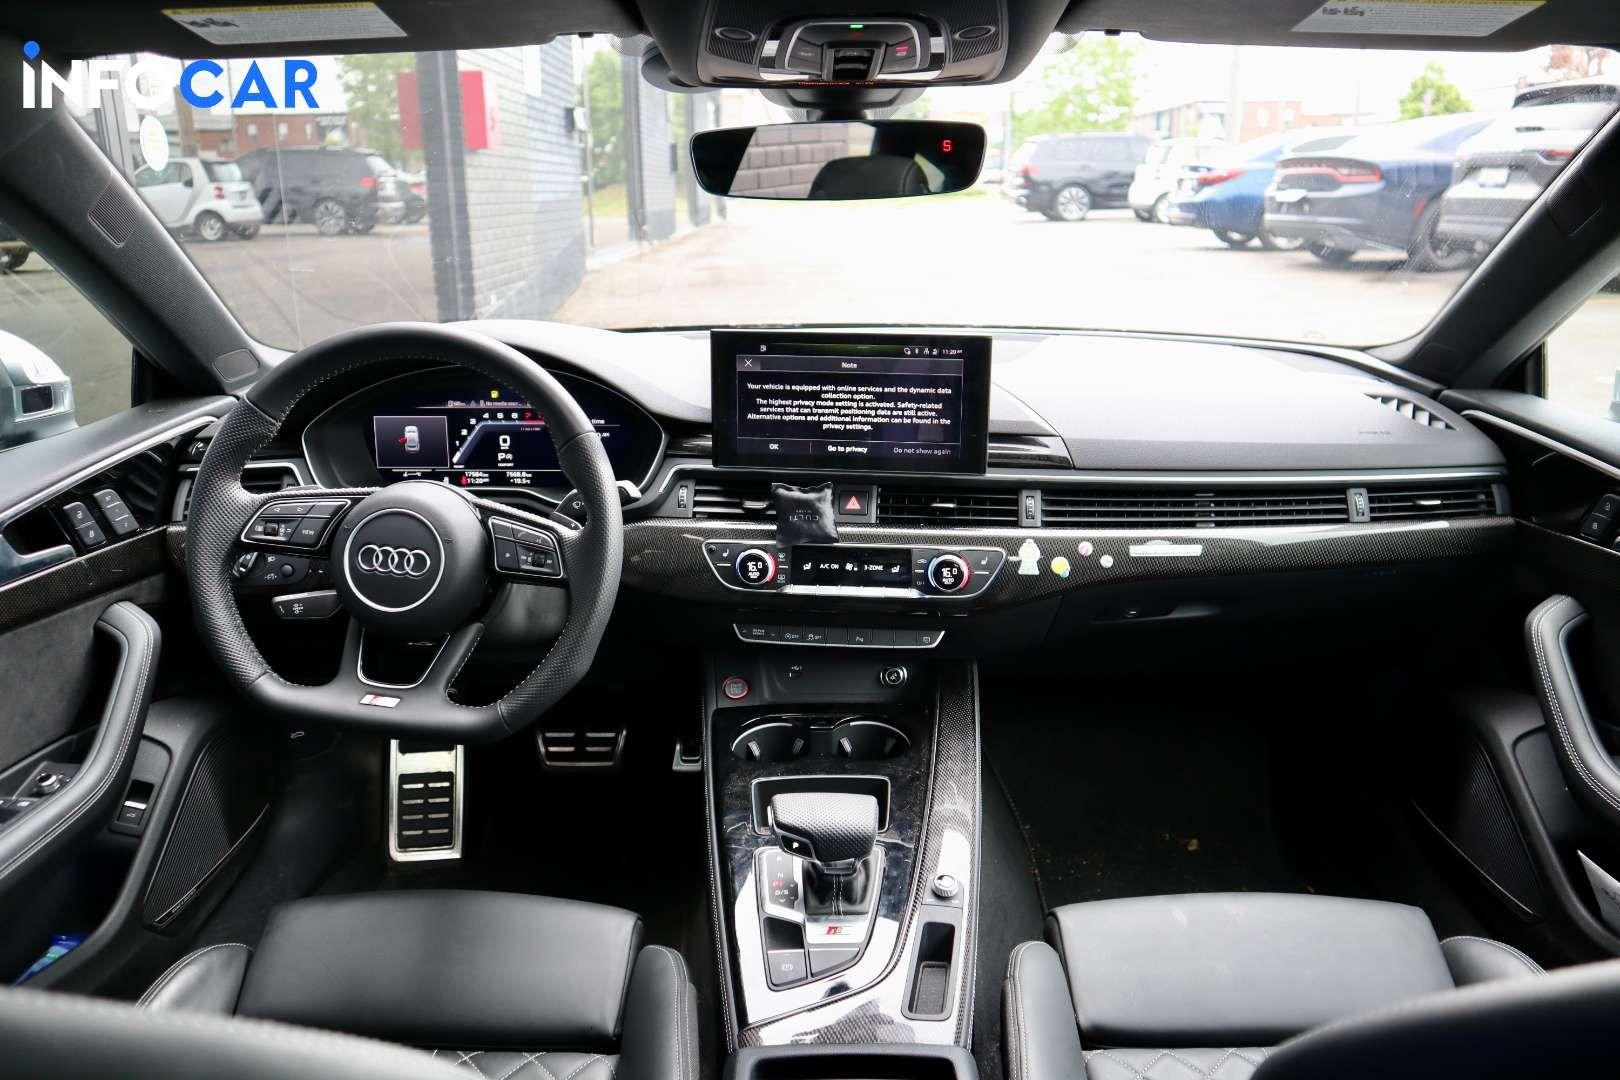 2020 Audi S5 Sportback - INFOCAR - Toronto's Most Comprehensive New and Used Auto Trading Platform